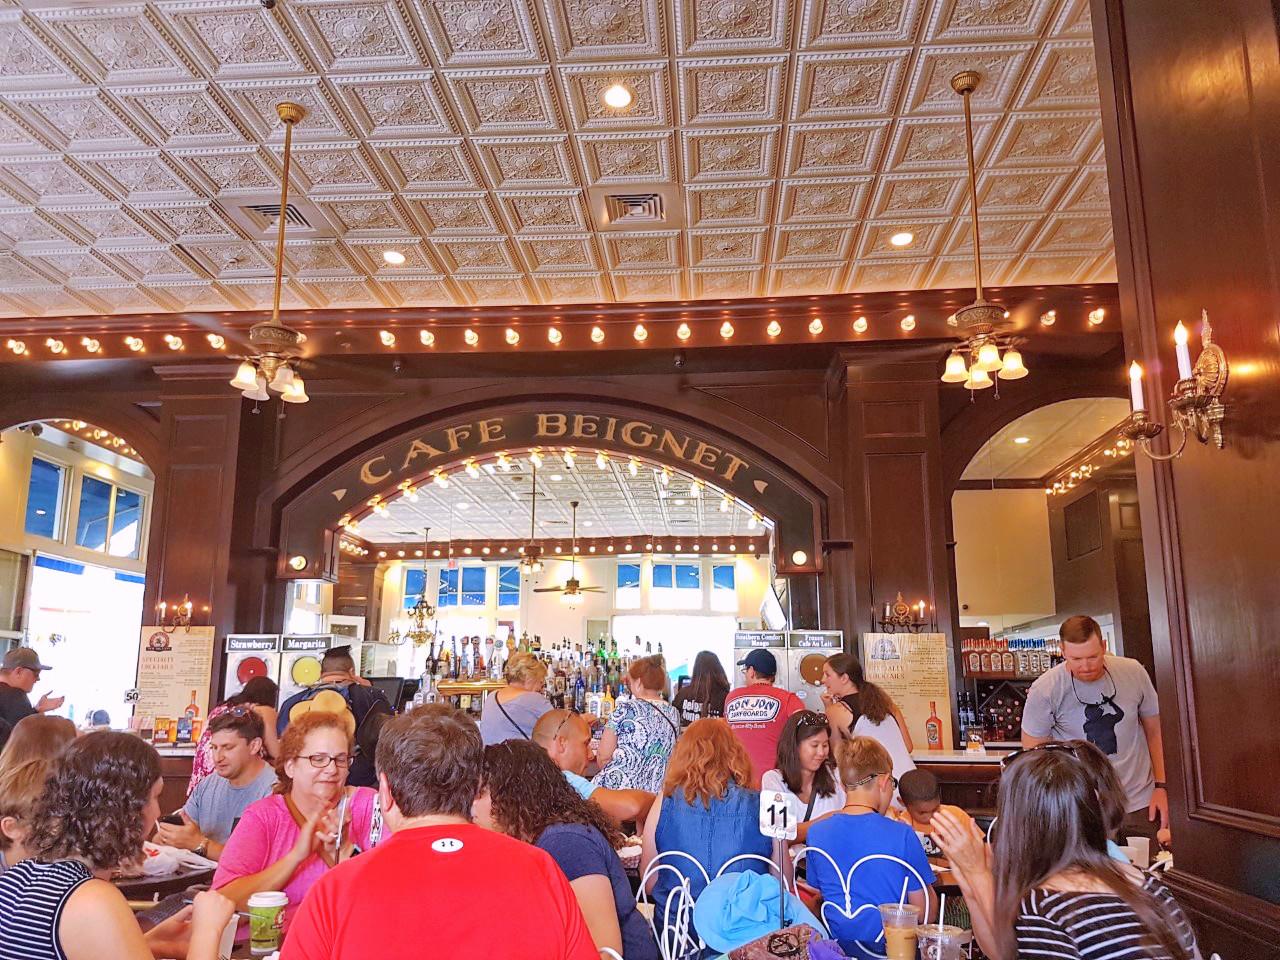 New Orleans, Louisiana, beignet, cafe, tourist, foodie, blogger, summer